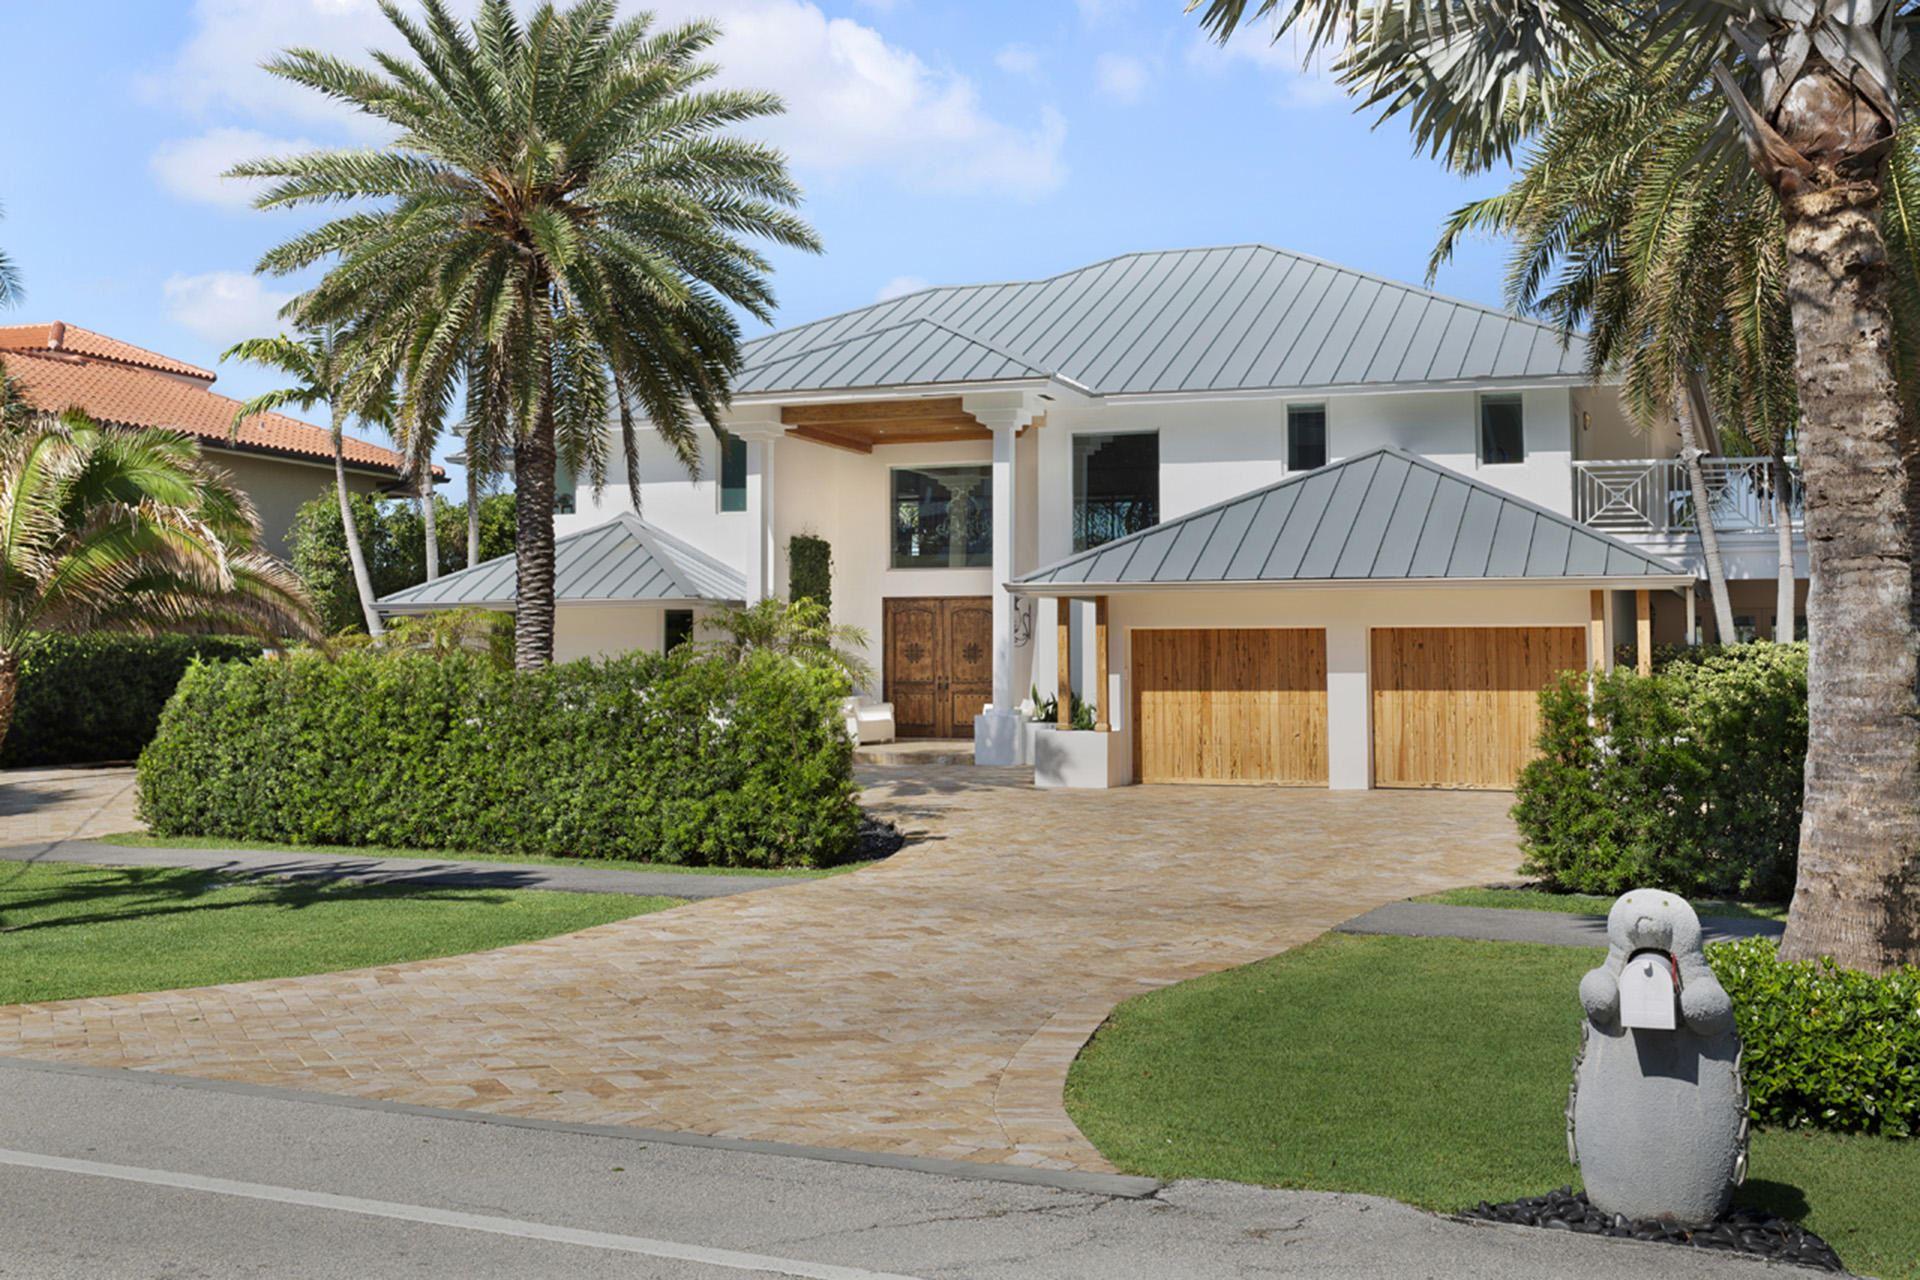 2540 S Ocean Boulevard, Highland Beach, FL 33487 - #: RX-10524814